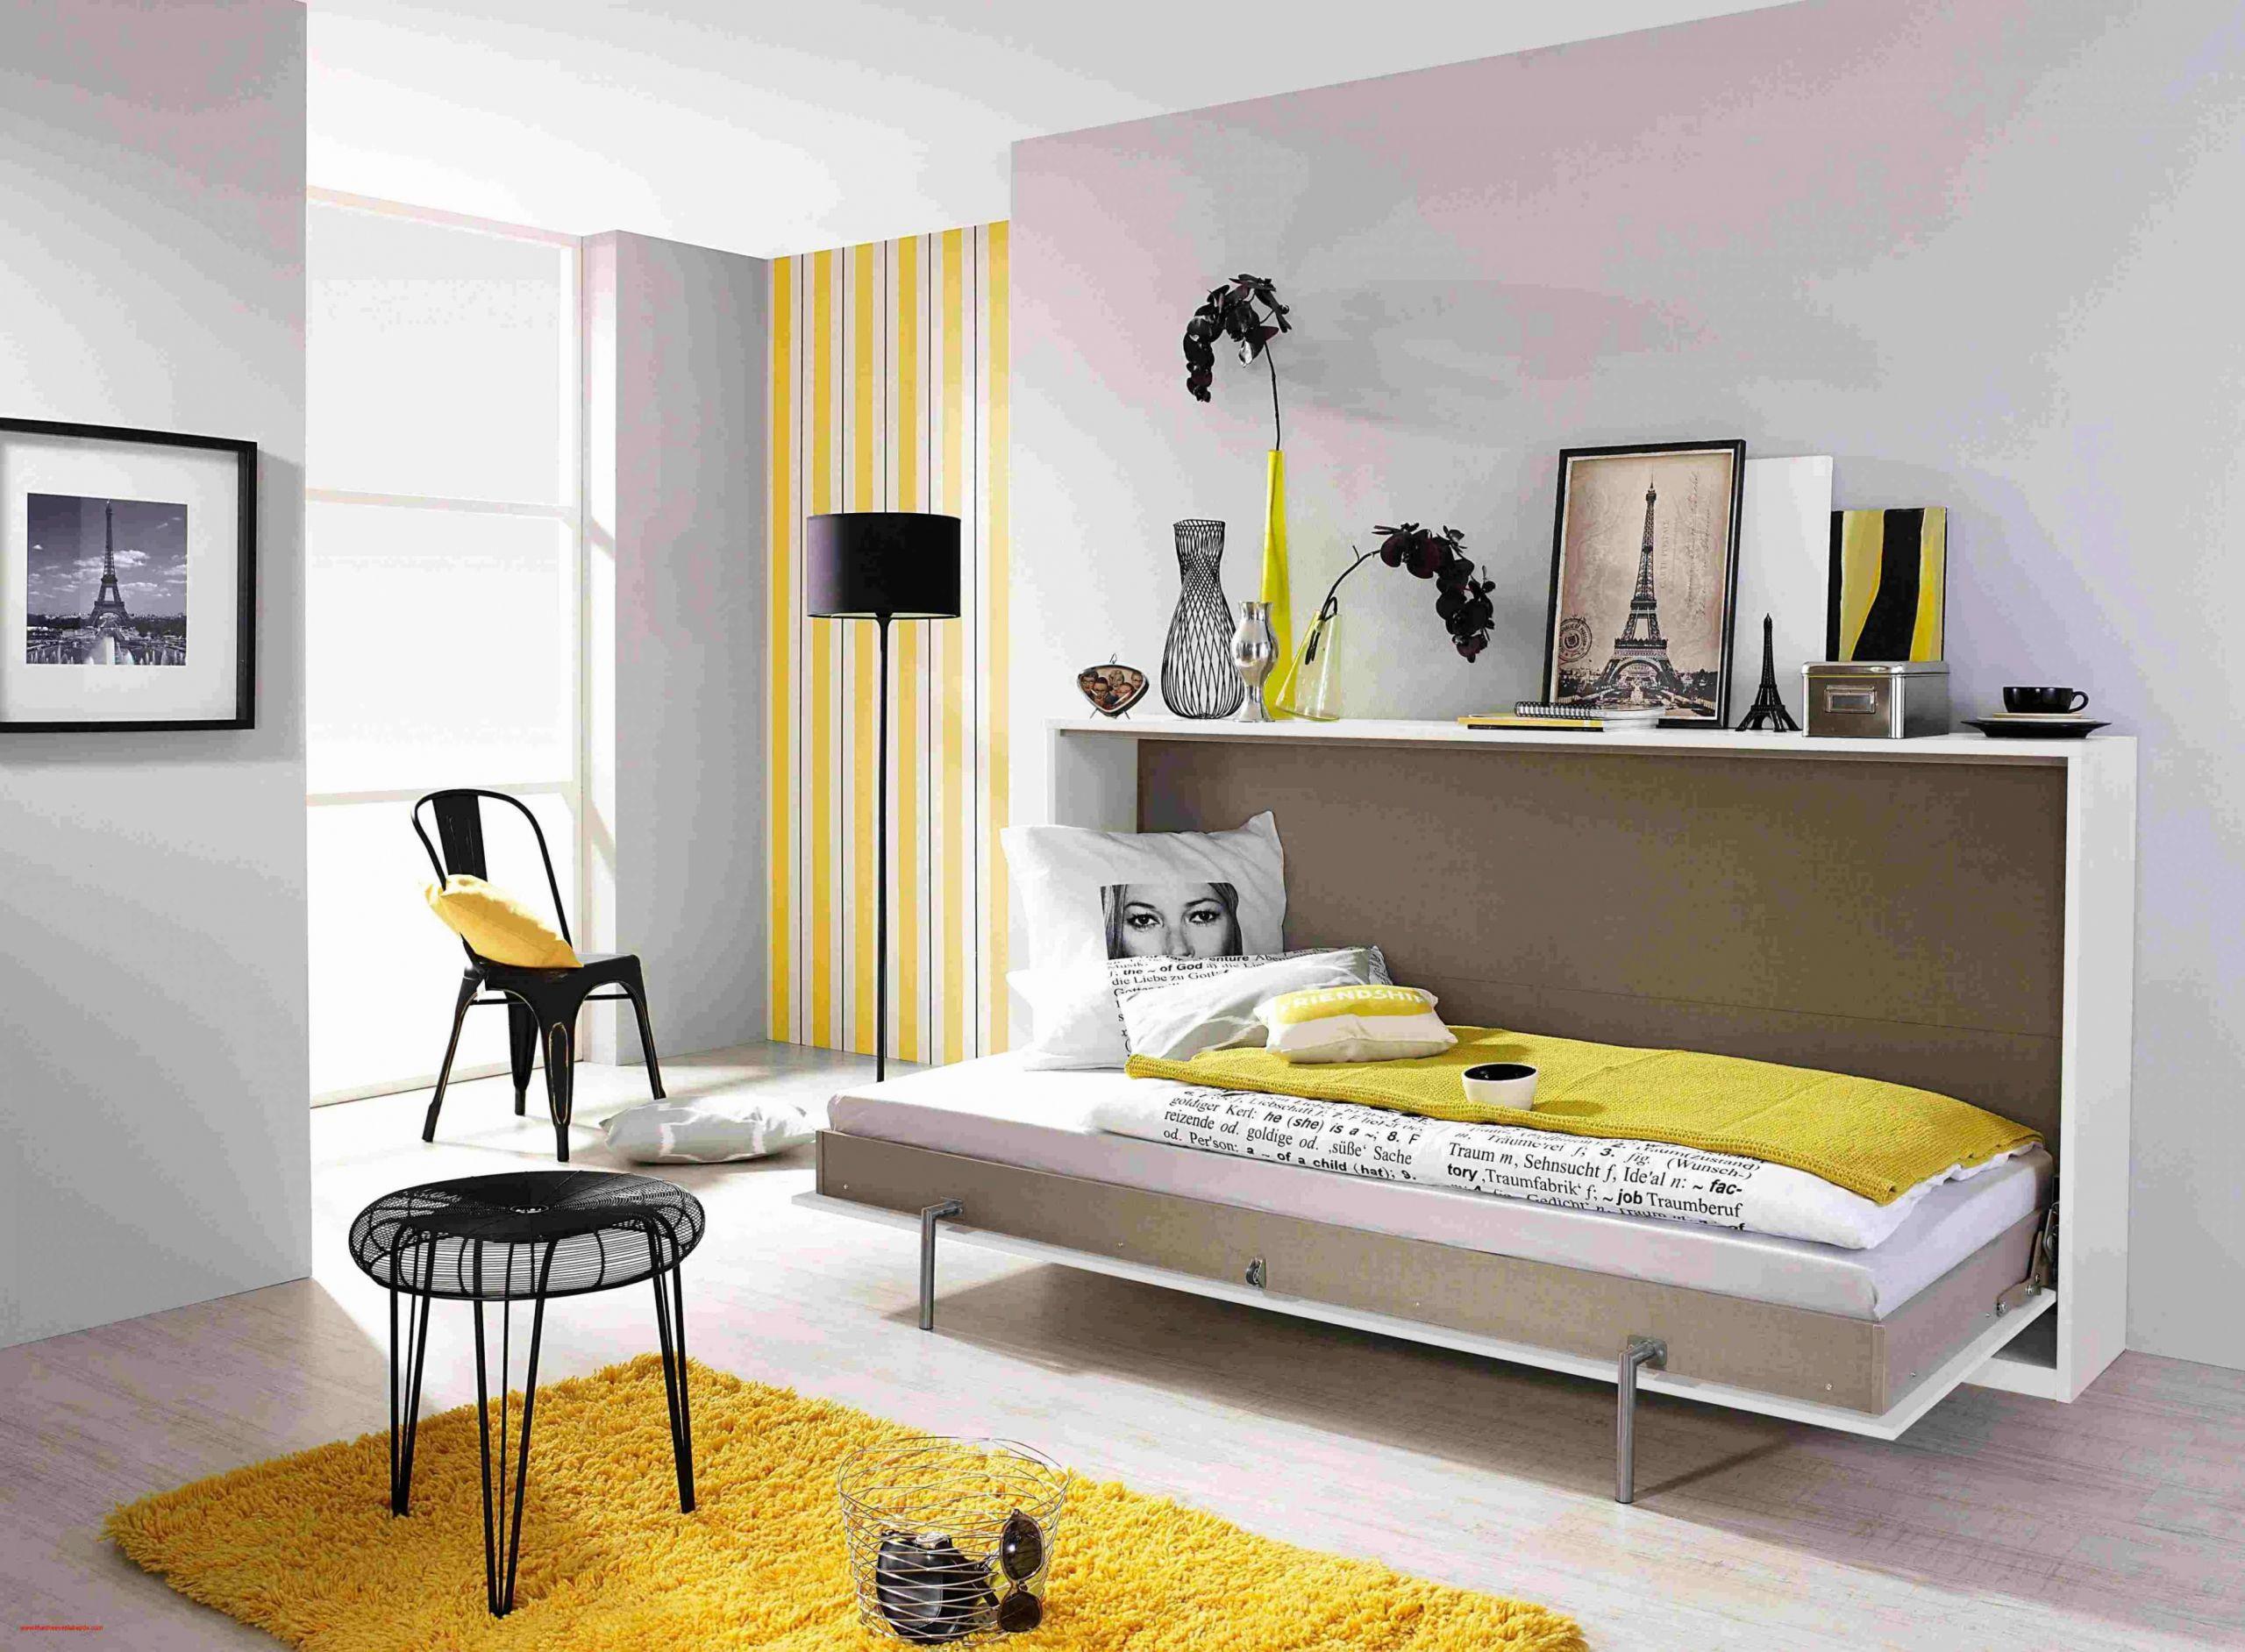 42 luxus ideen fur kleine garten galerie ideen mit alten turen ideen mit alten turen